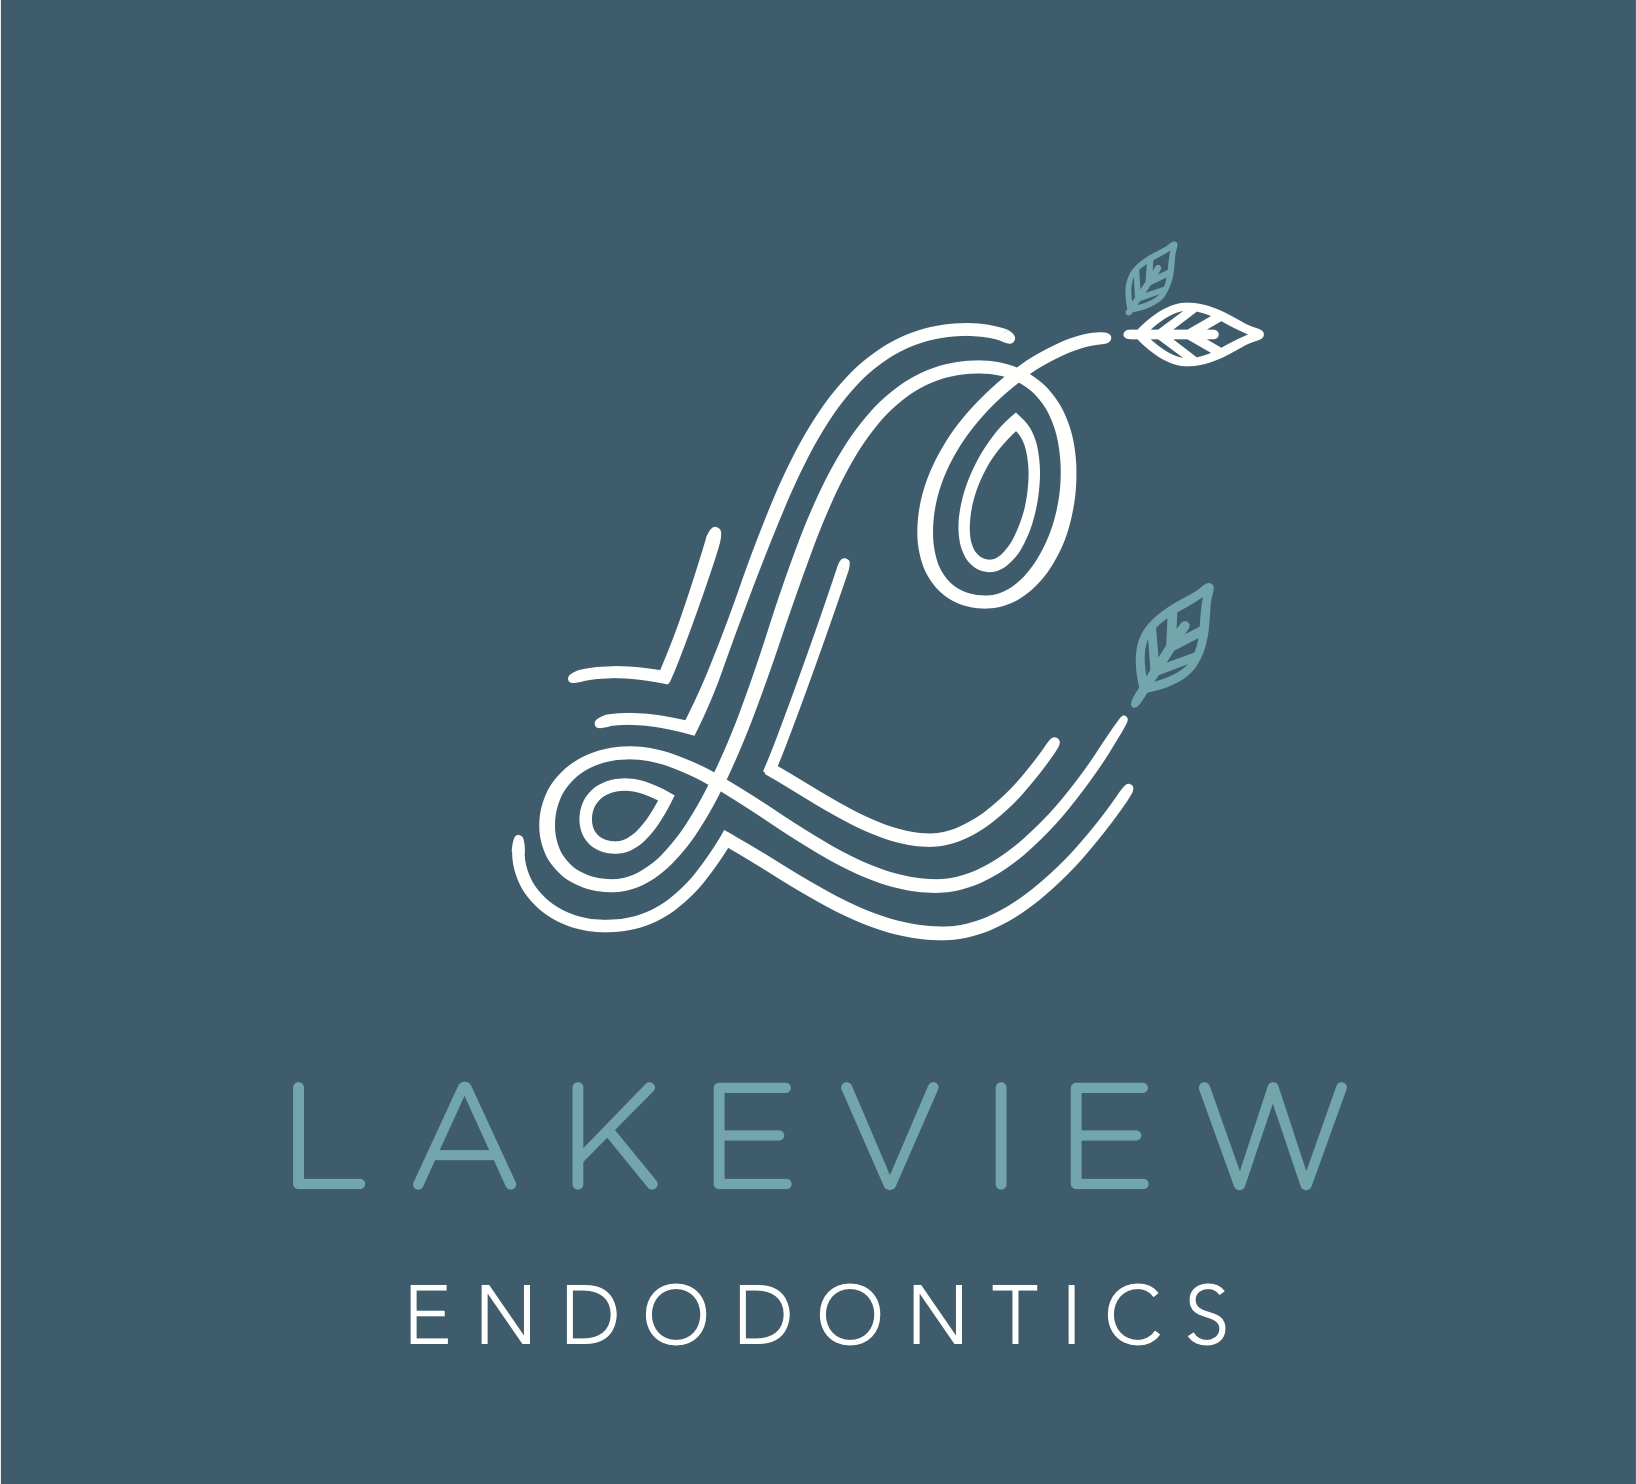 Lakeview Endodontics